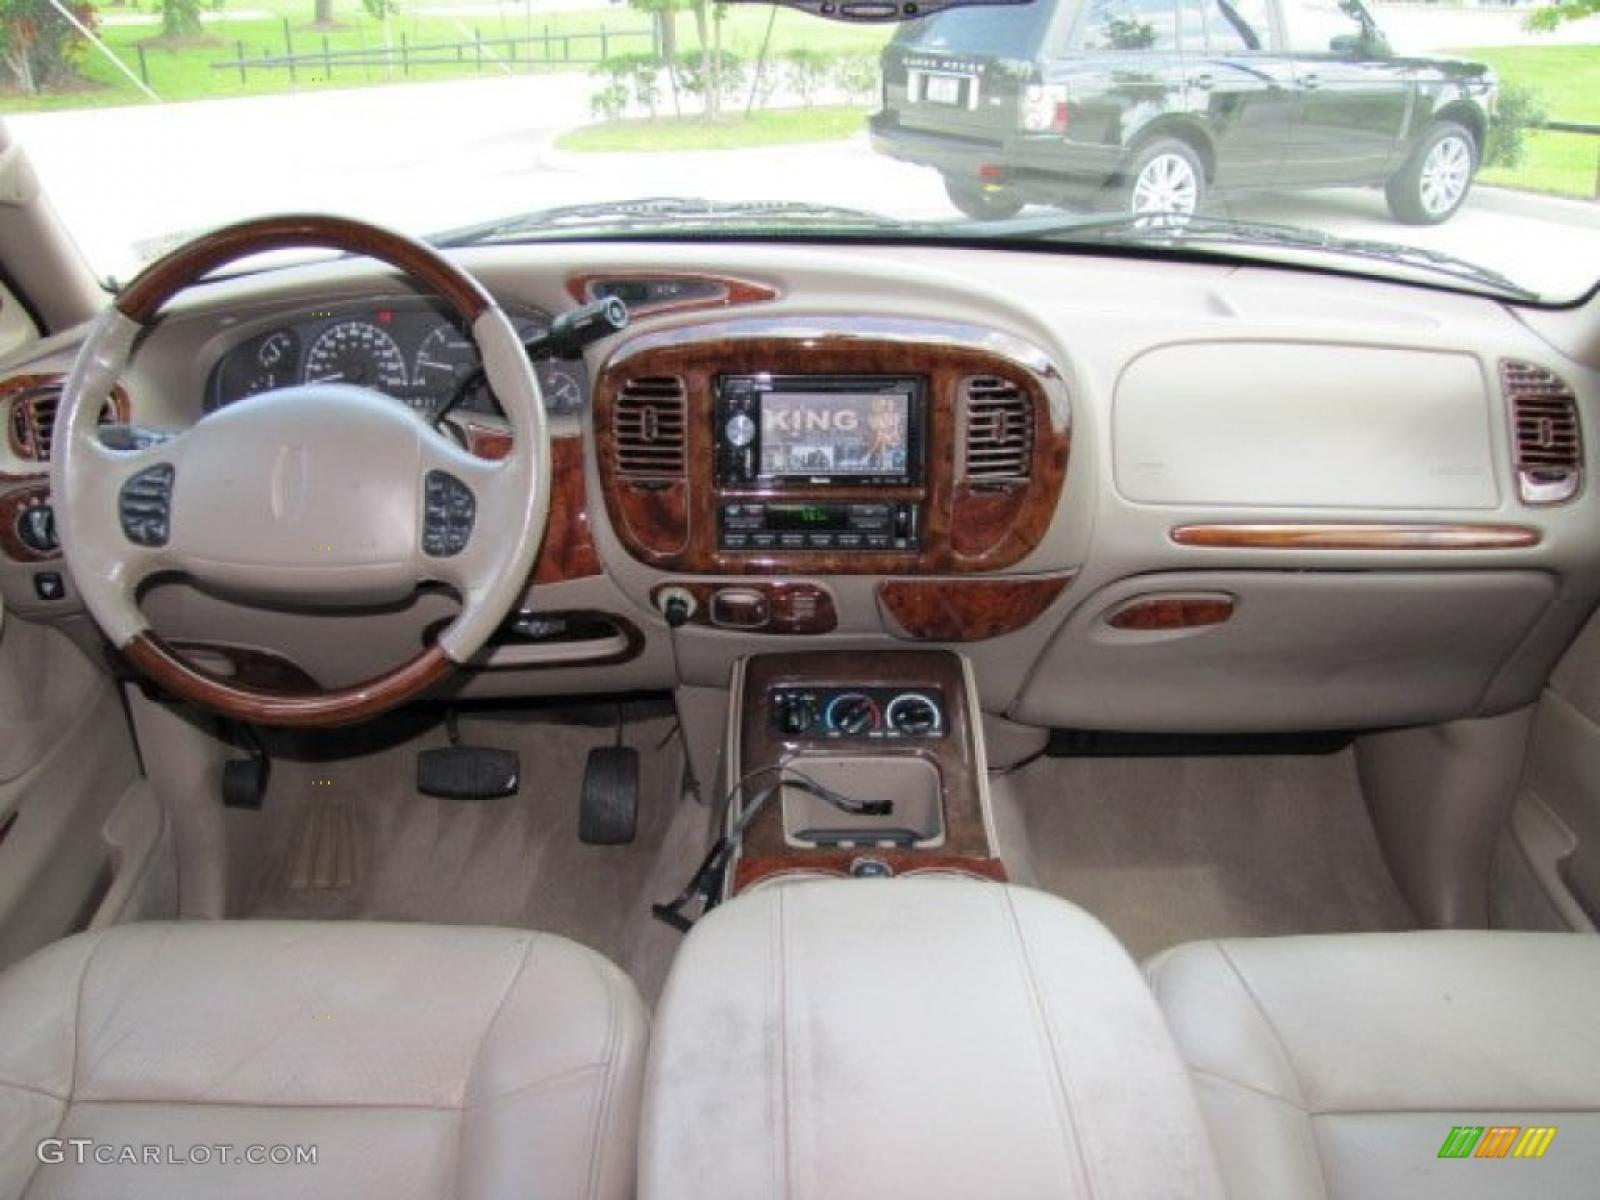 800 1024 1280 1600 Origin 2001 Lincoln Navigator